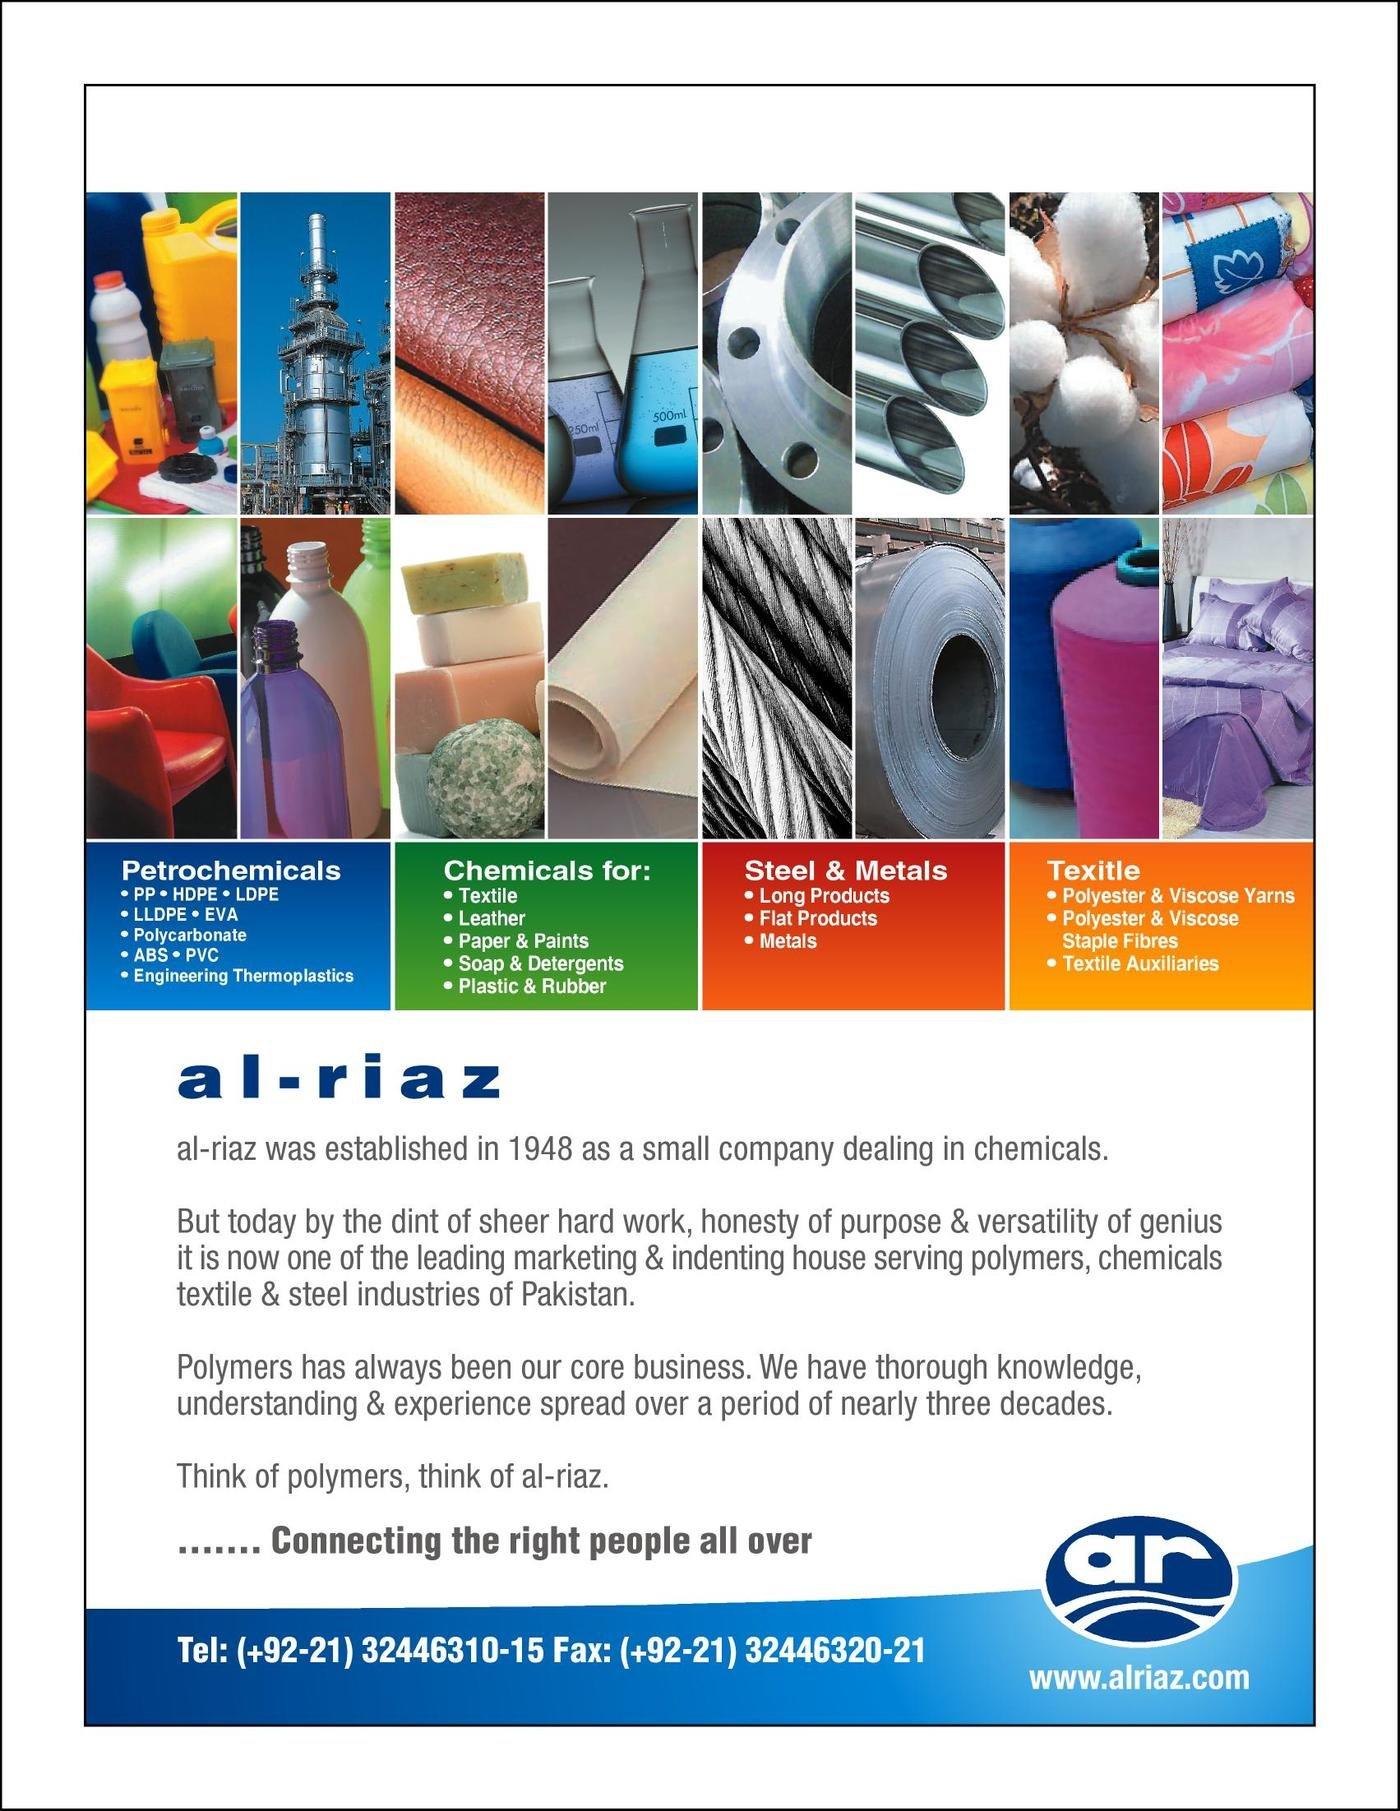 Pakplas Advertisement 2012 by Khalid Farooq at Coroflot com